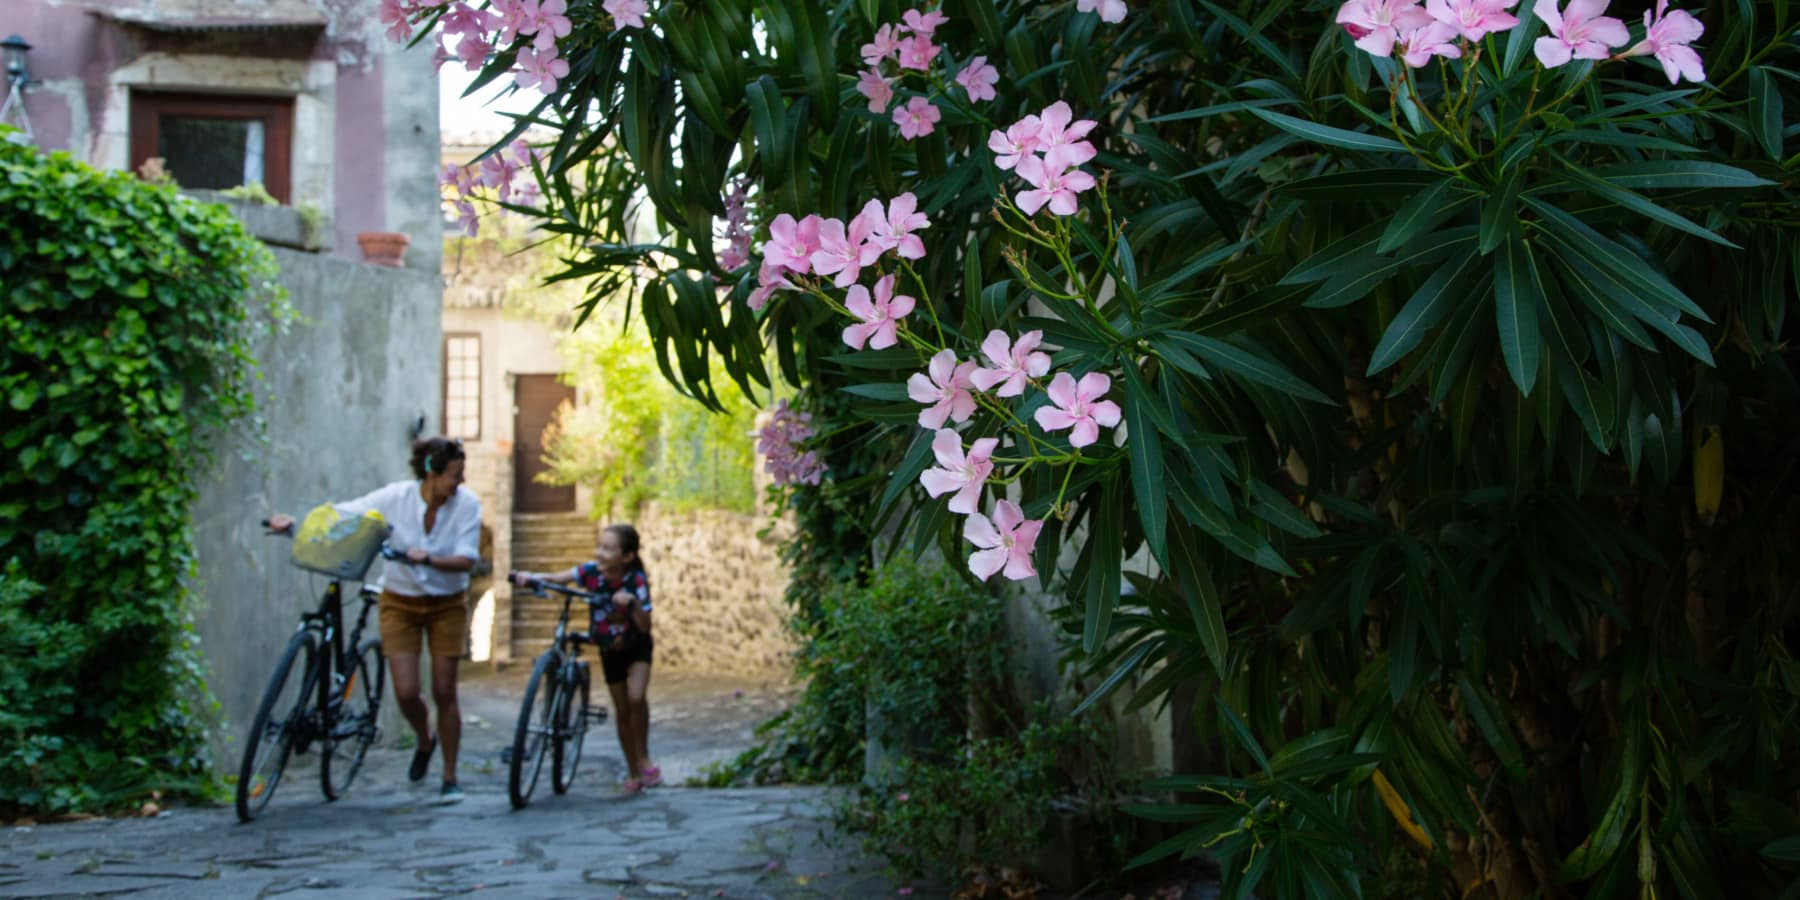 Rue-Alba-la-Romaine-Vélo-@G-Edouart-ADT07